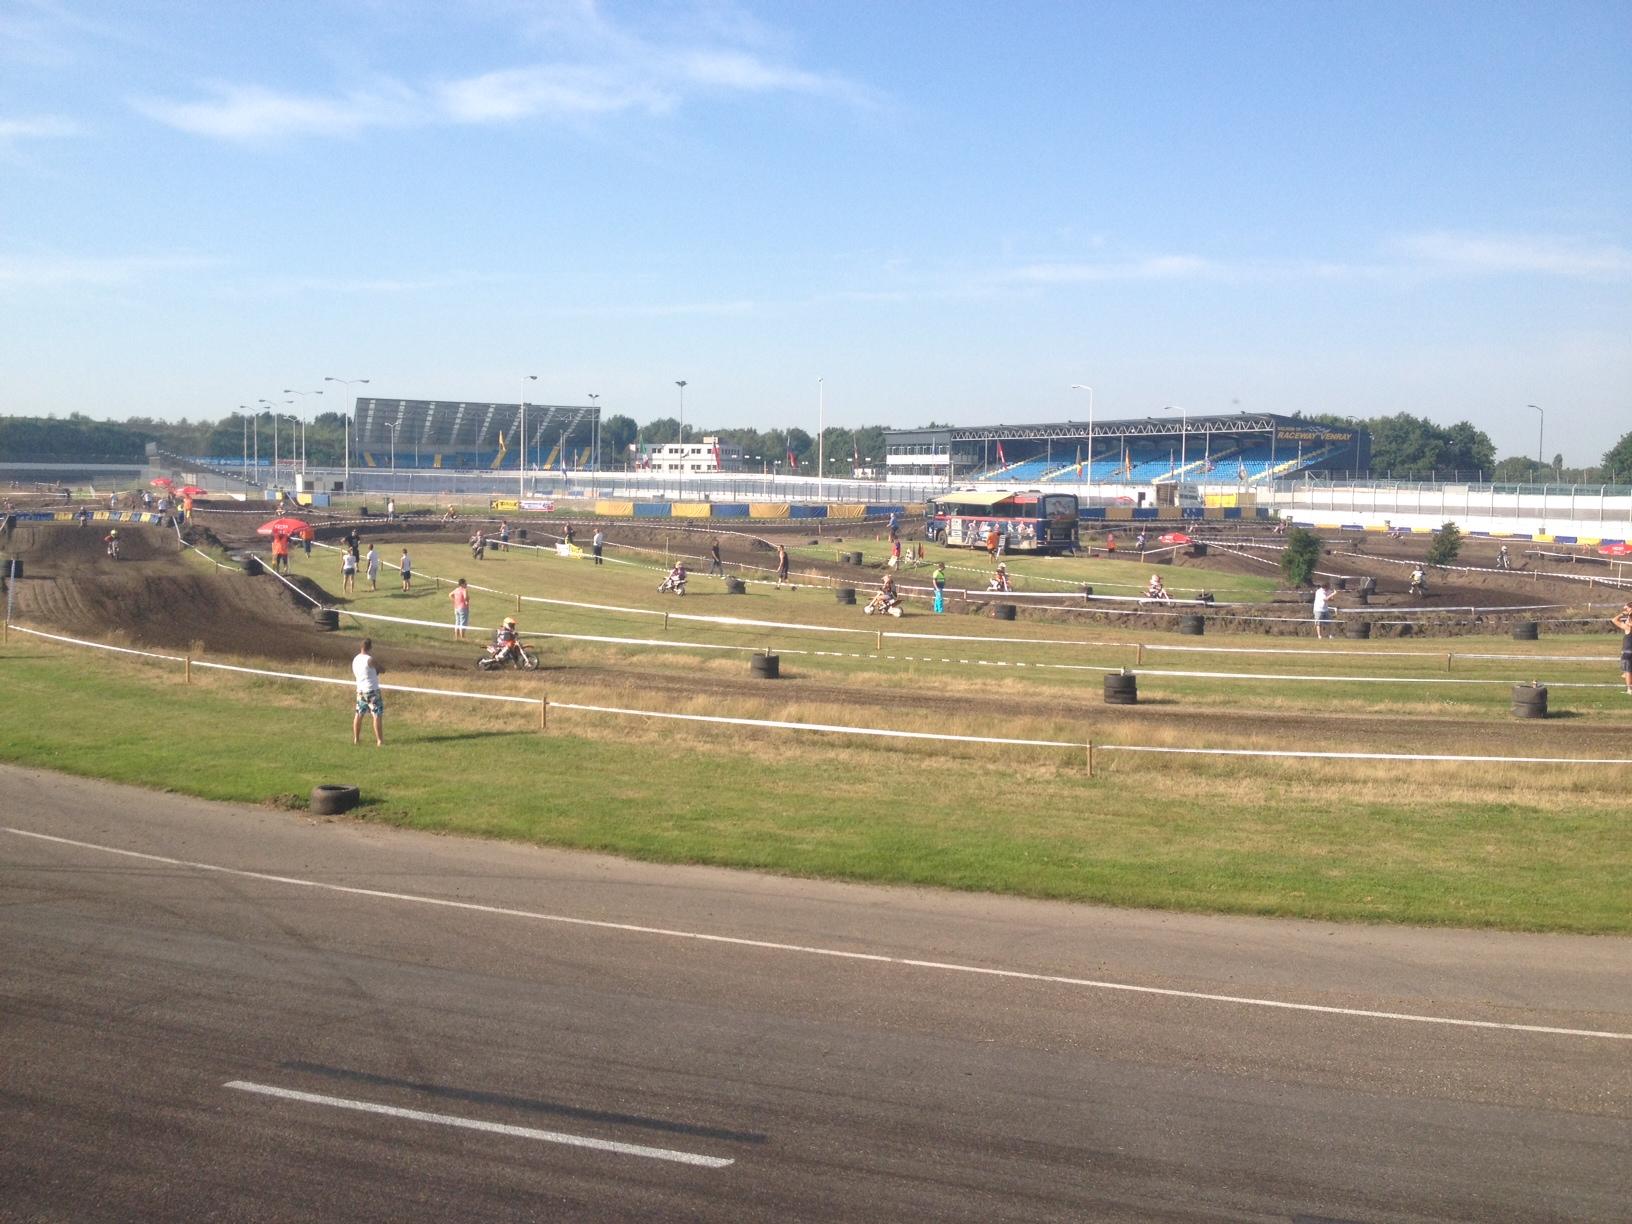 Youth IMBA, Europameisterschafts-Strecke im Motodrom